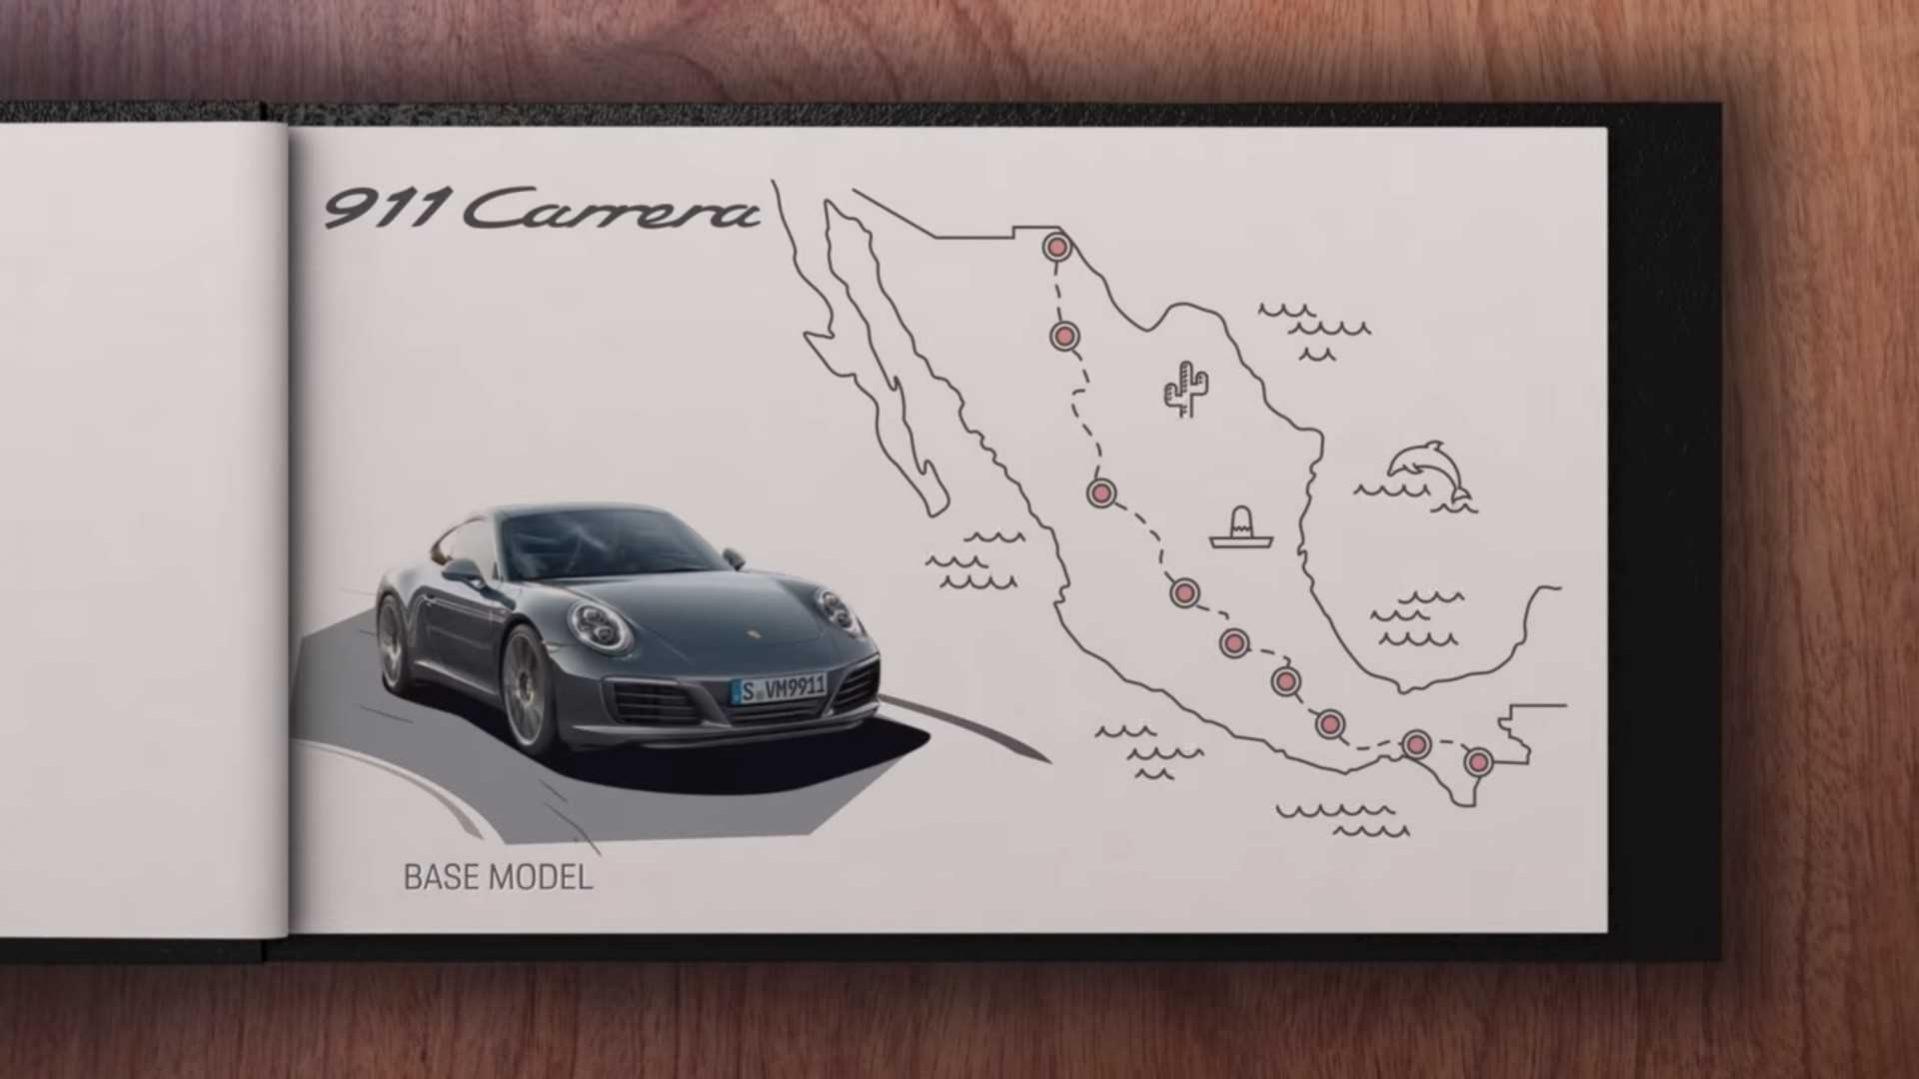 Porsche 911 Carrera For Sale UK